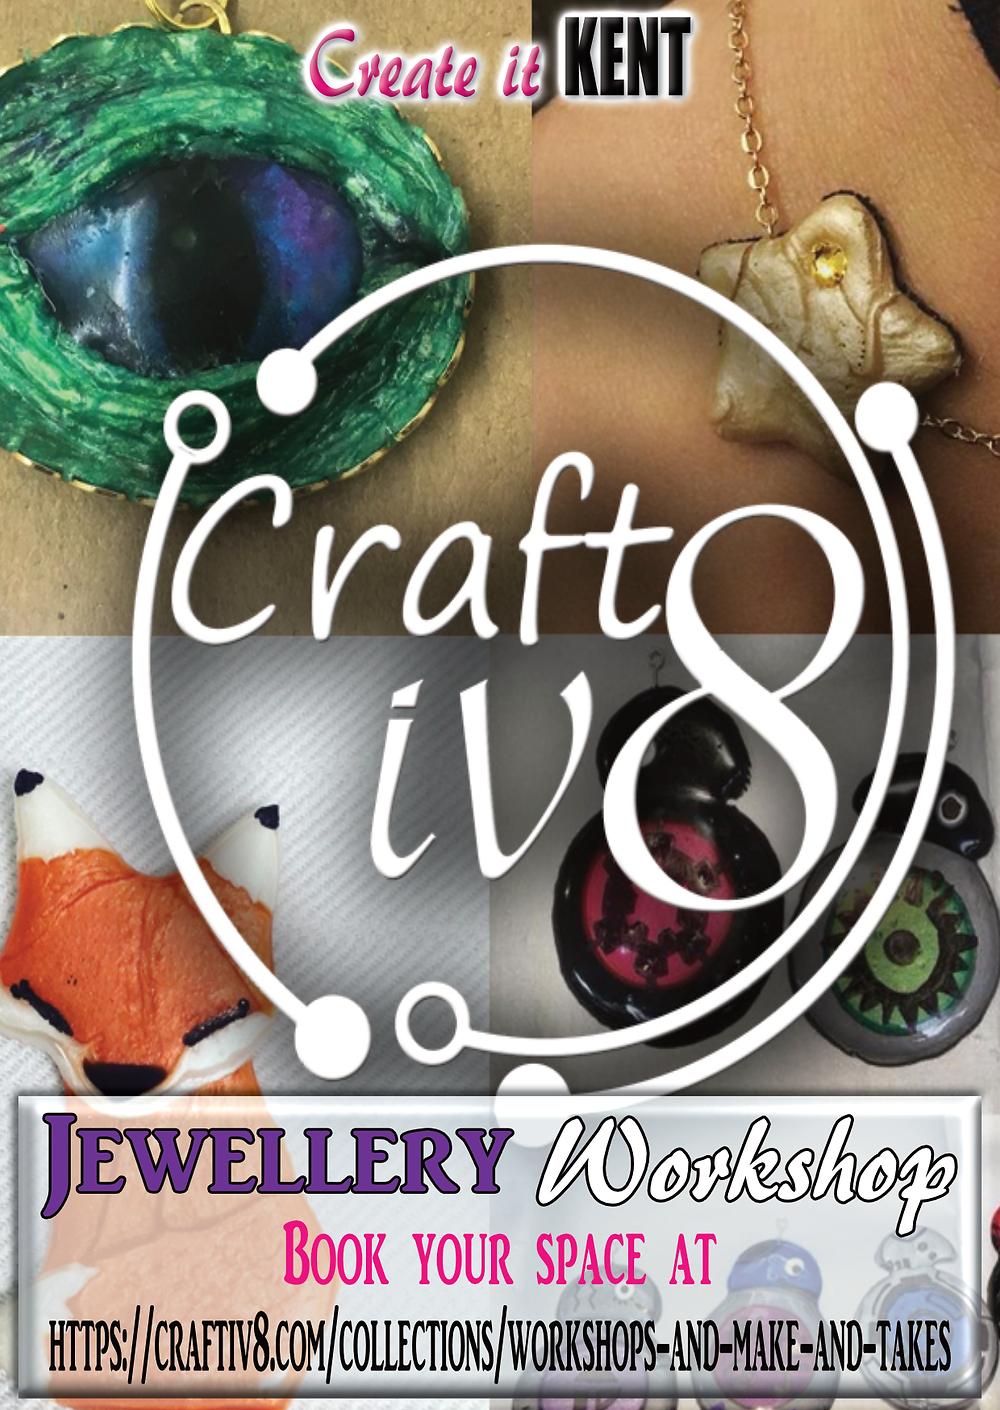 Jewellery Workshop with Craftiv8